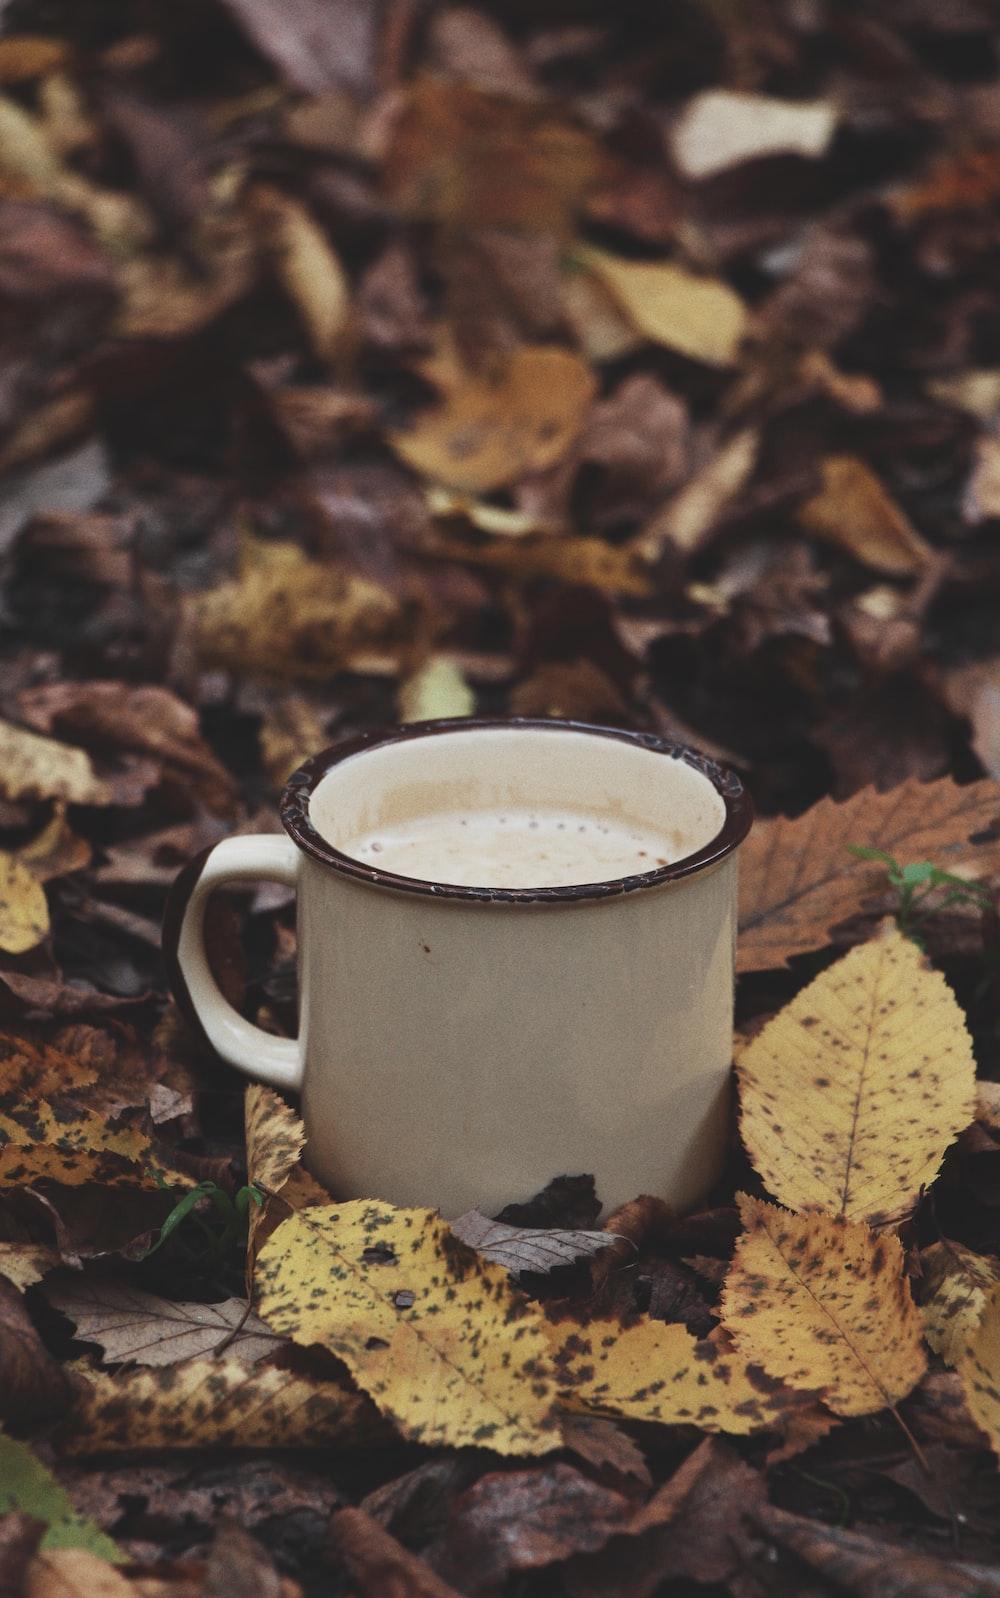 white ceramic mug on dried leaves